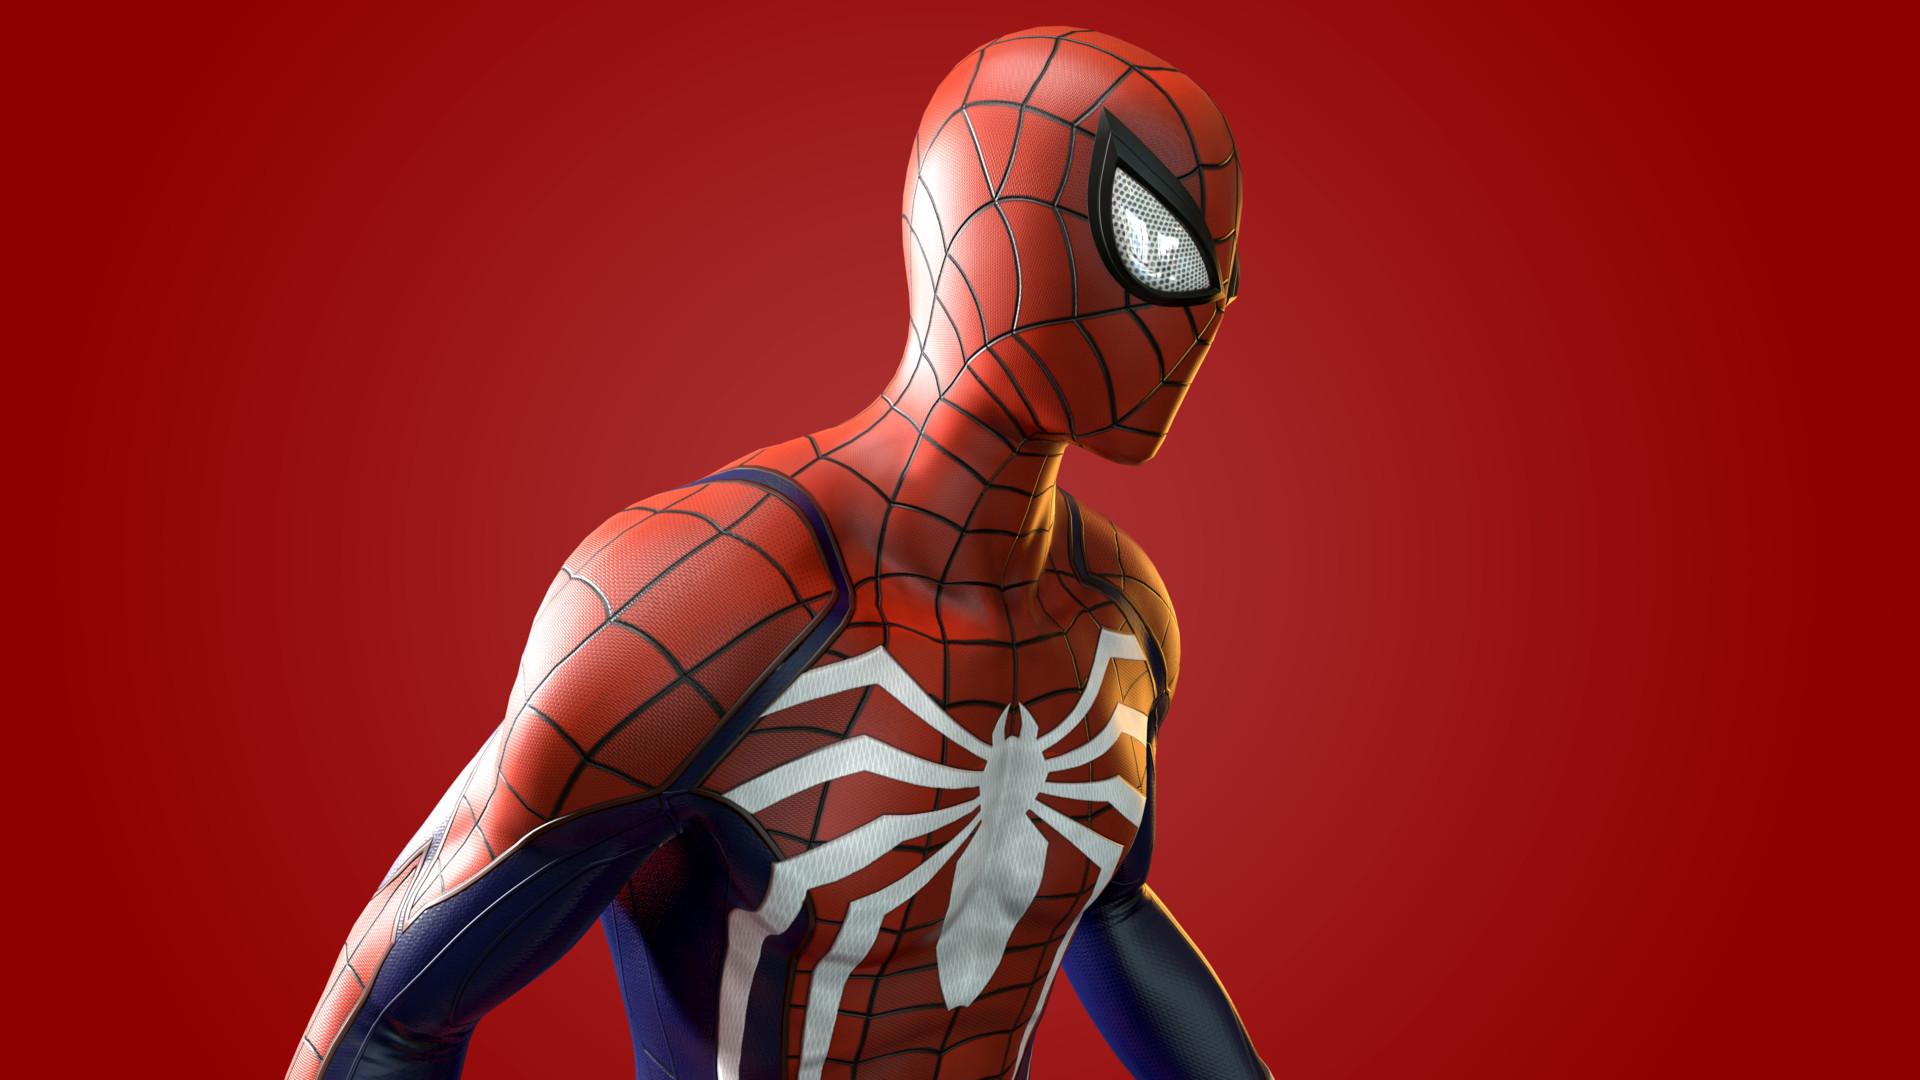 Marvel Spider Man Ps4 Fanartwork Hd Superheroes 4k Wallpapers